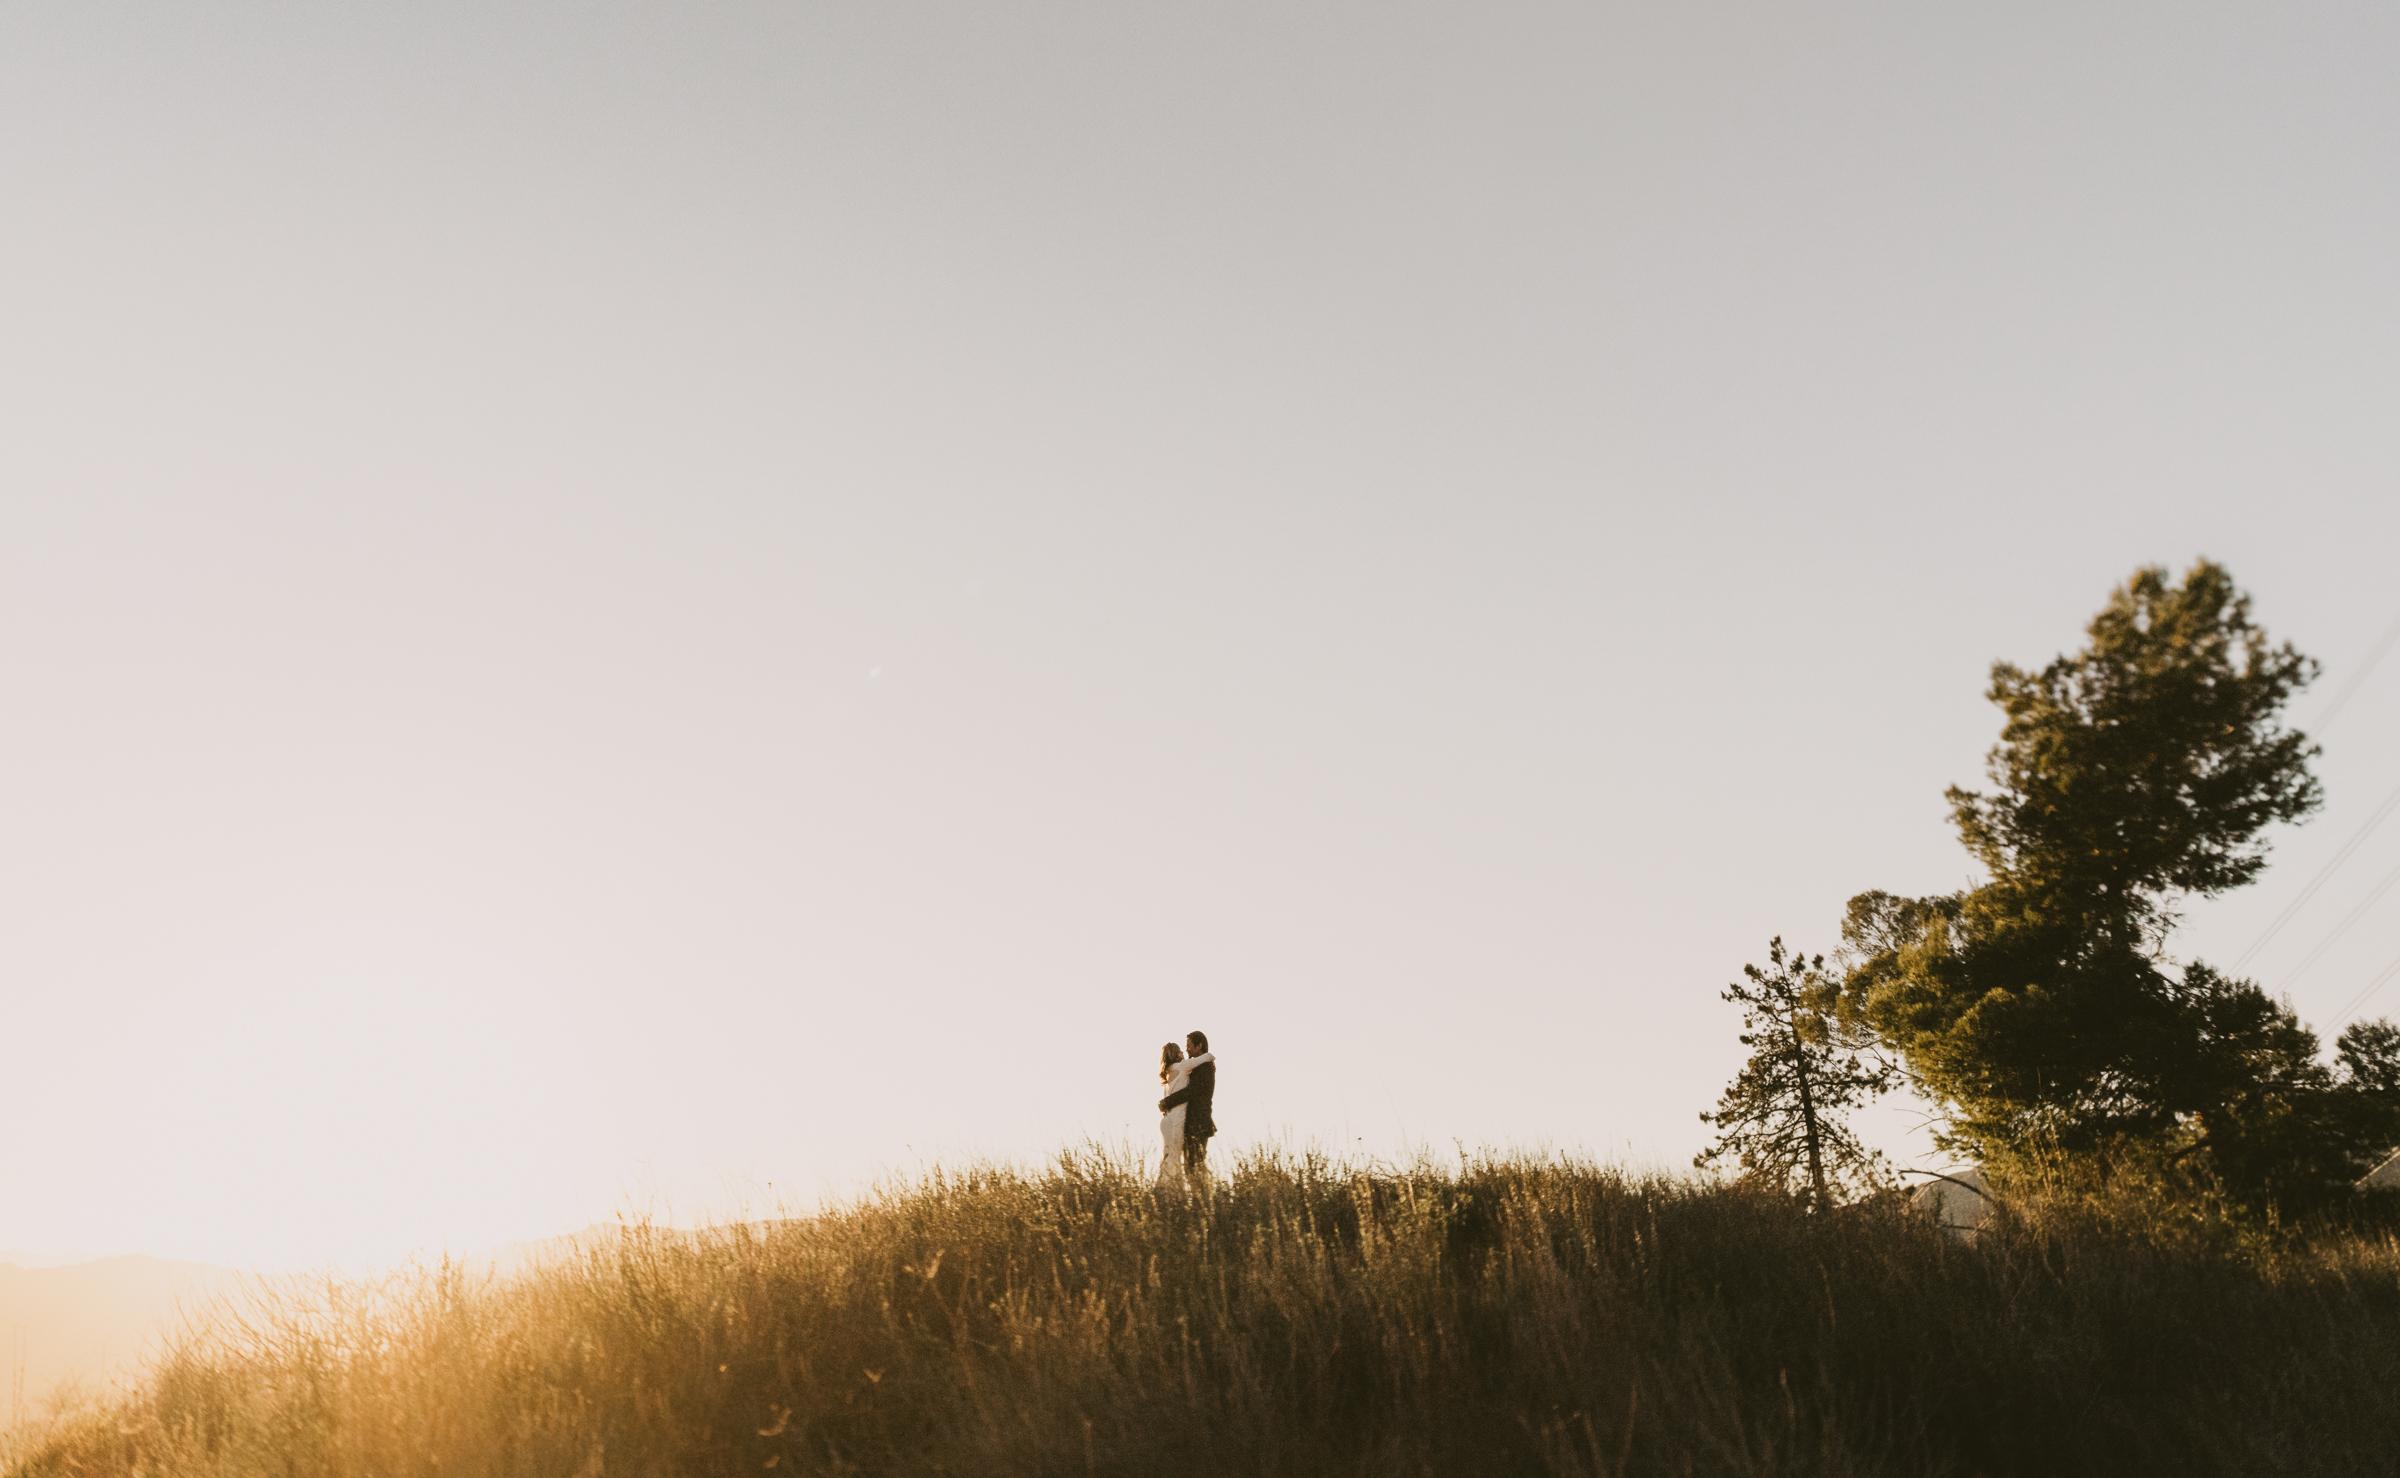 ©Isaiah + Taylor Photography - Intimate Elopement, Eaton Canyon, Los Angeles Wedding Photographer-68.jpg